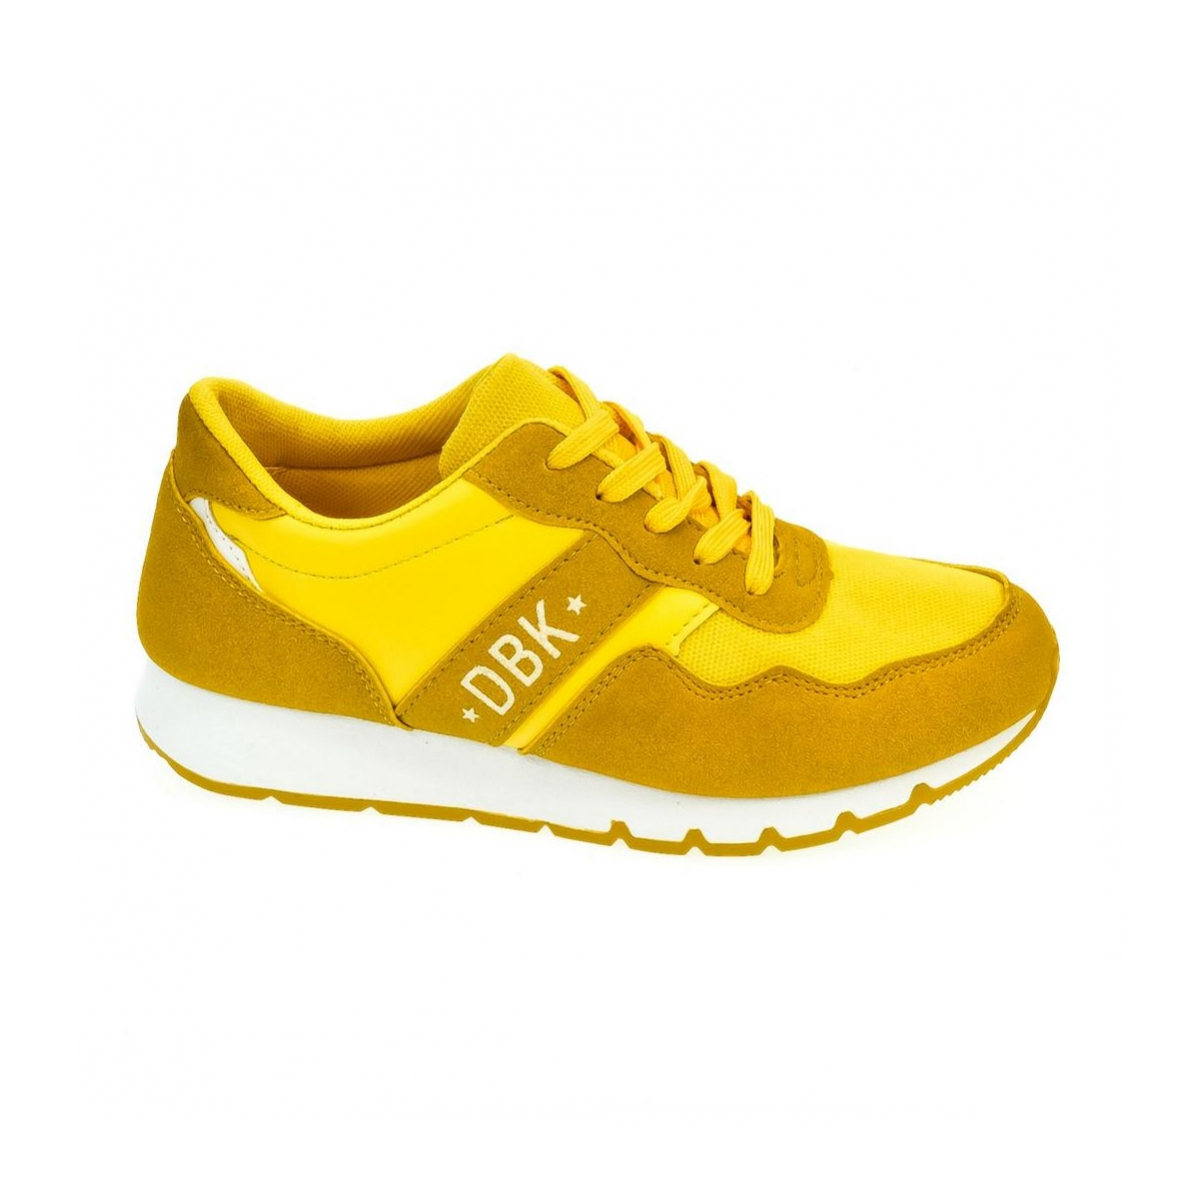 3d7fb8f67cbee Dámske žlté tenisky MARI - 4